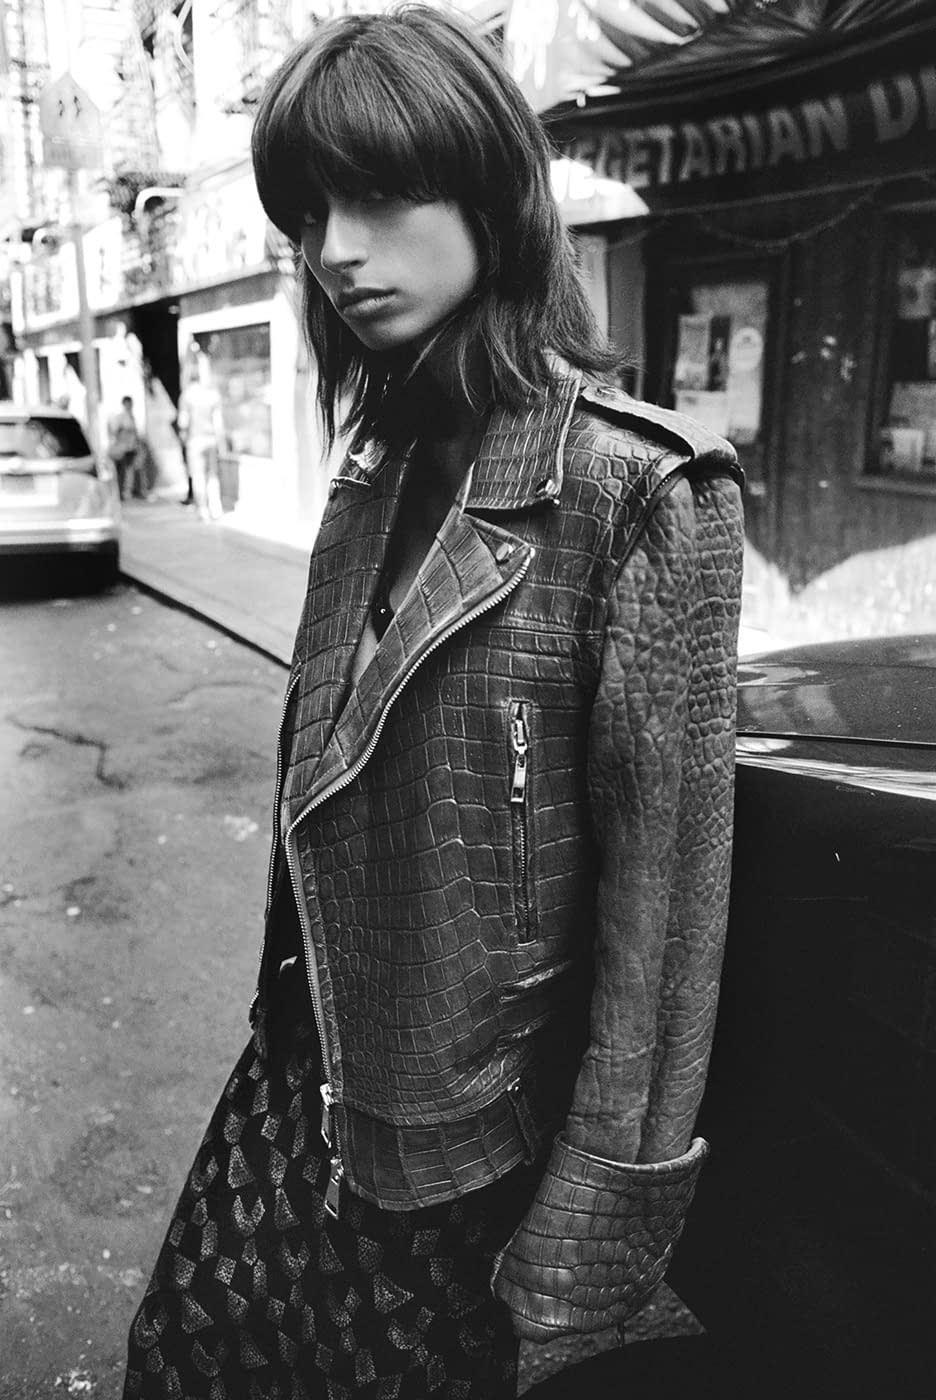 New York Stories 1 photo Enric Galceran - 171